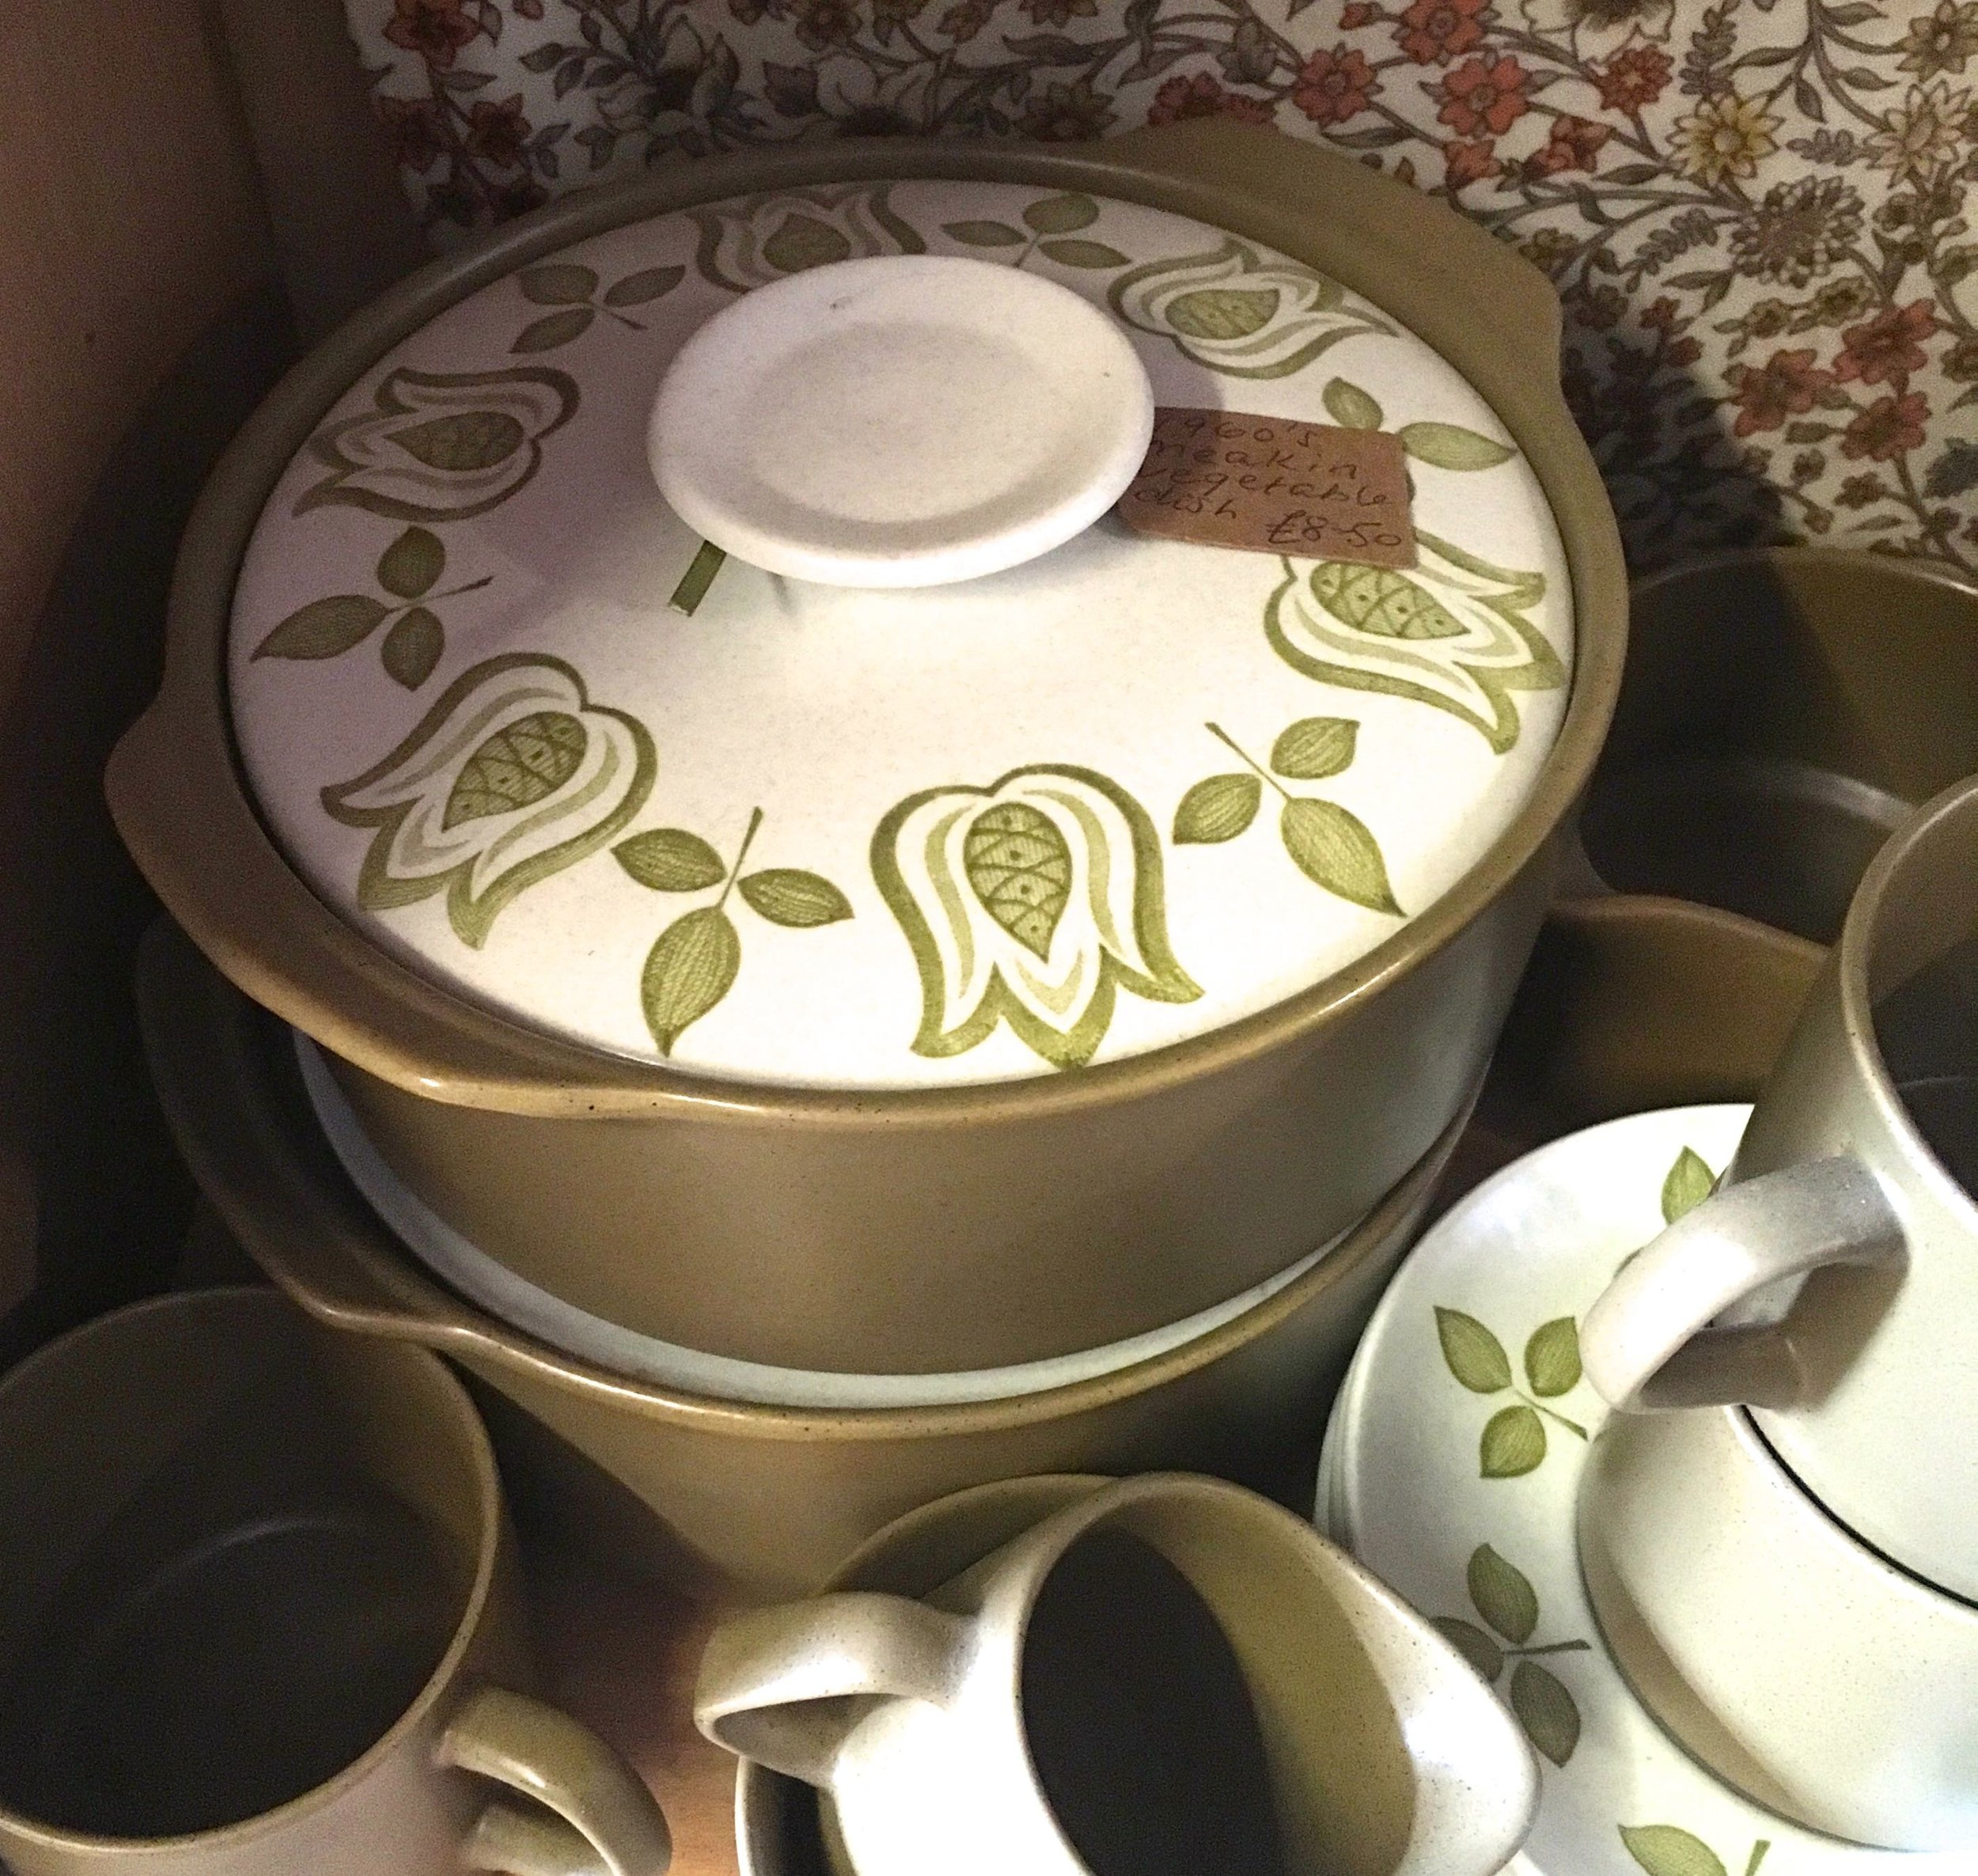 Tulip patterned dinnerware